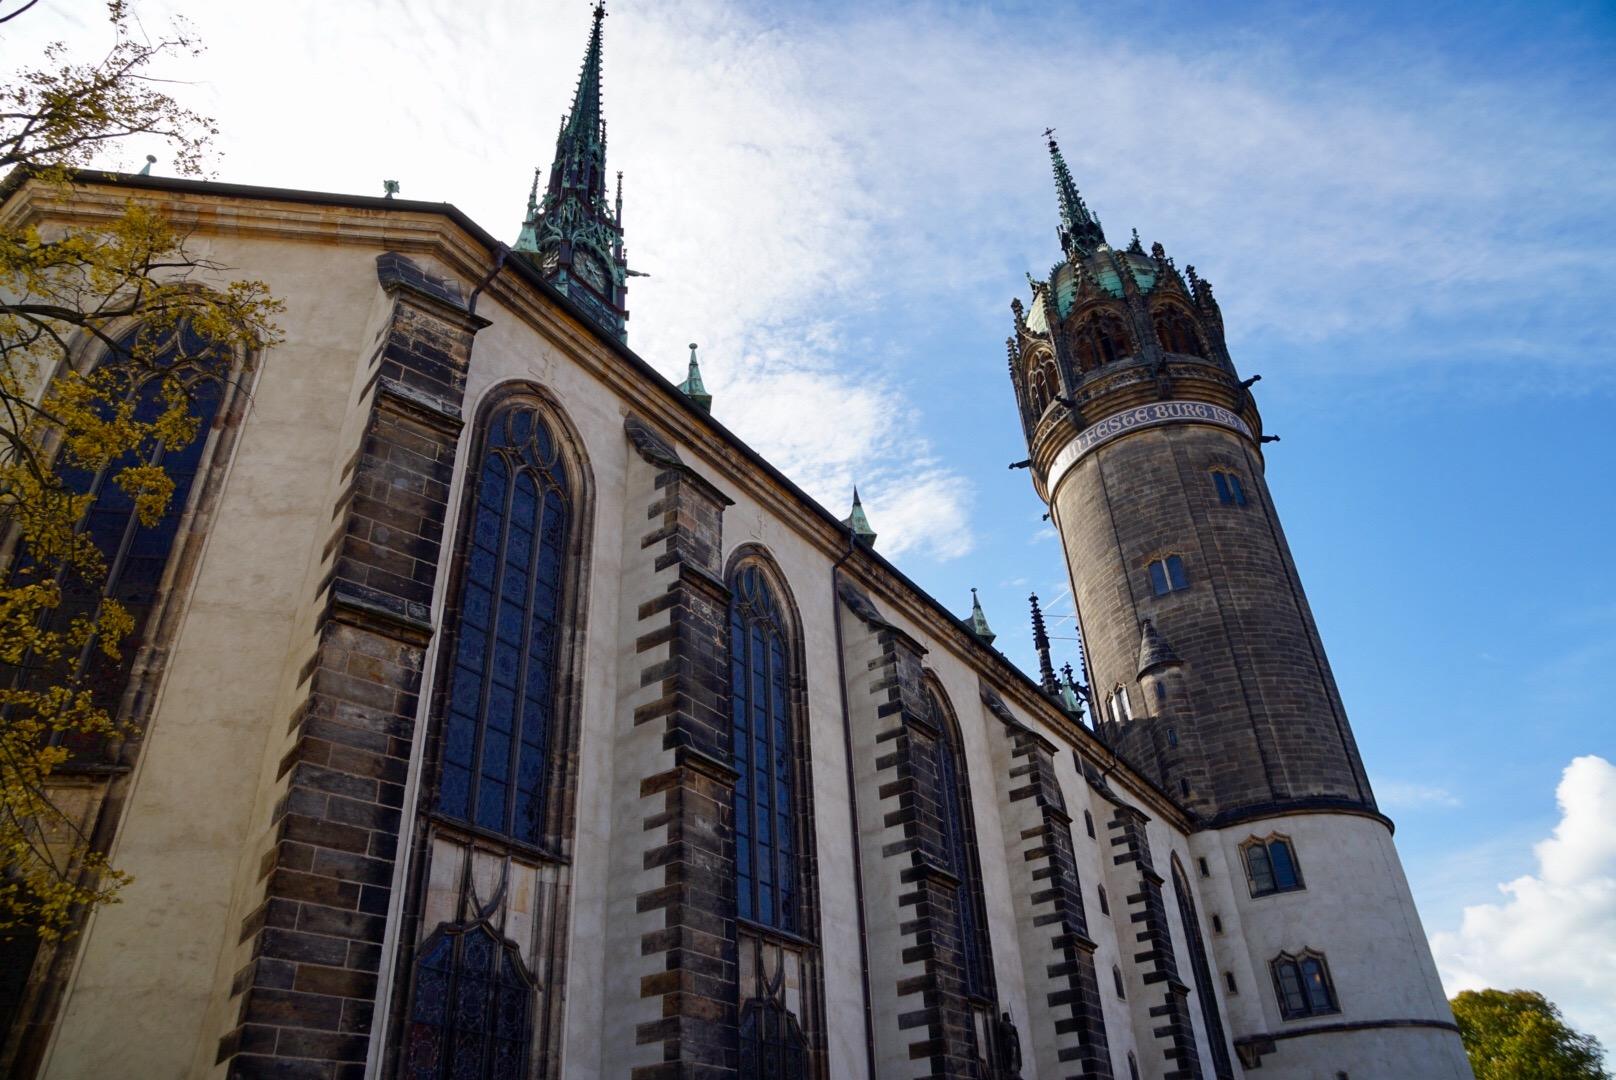 Castle Church in Wittenberg, Saxony Germany